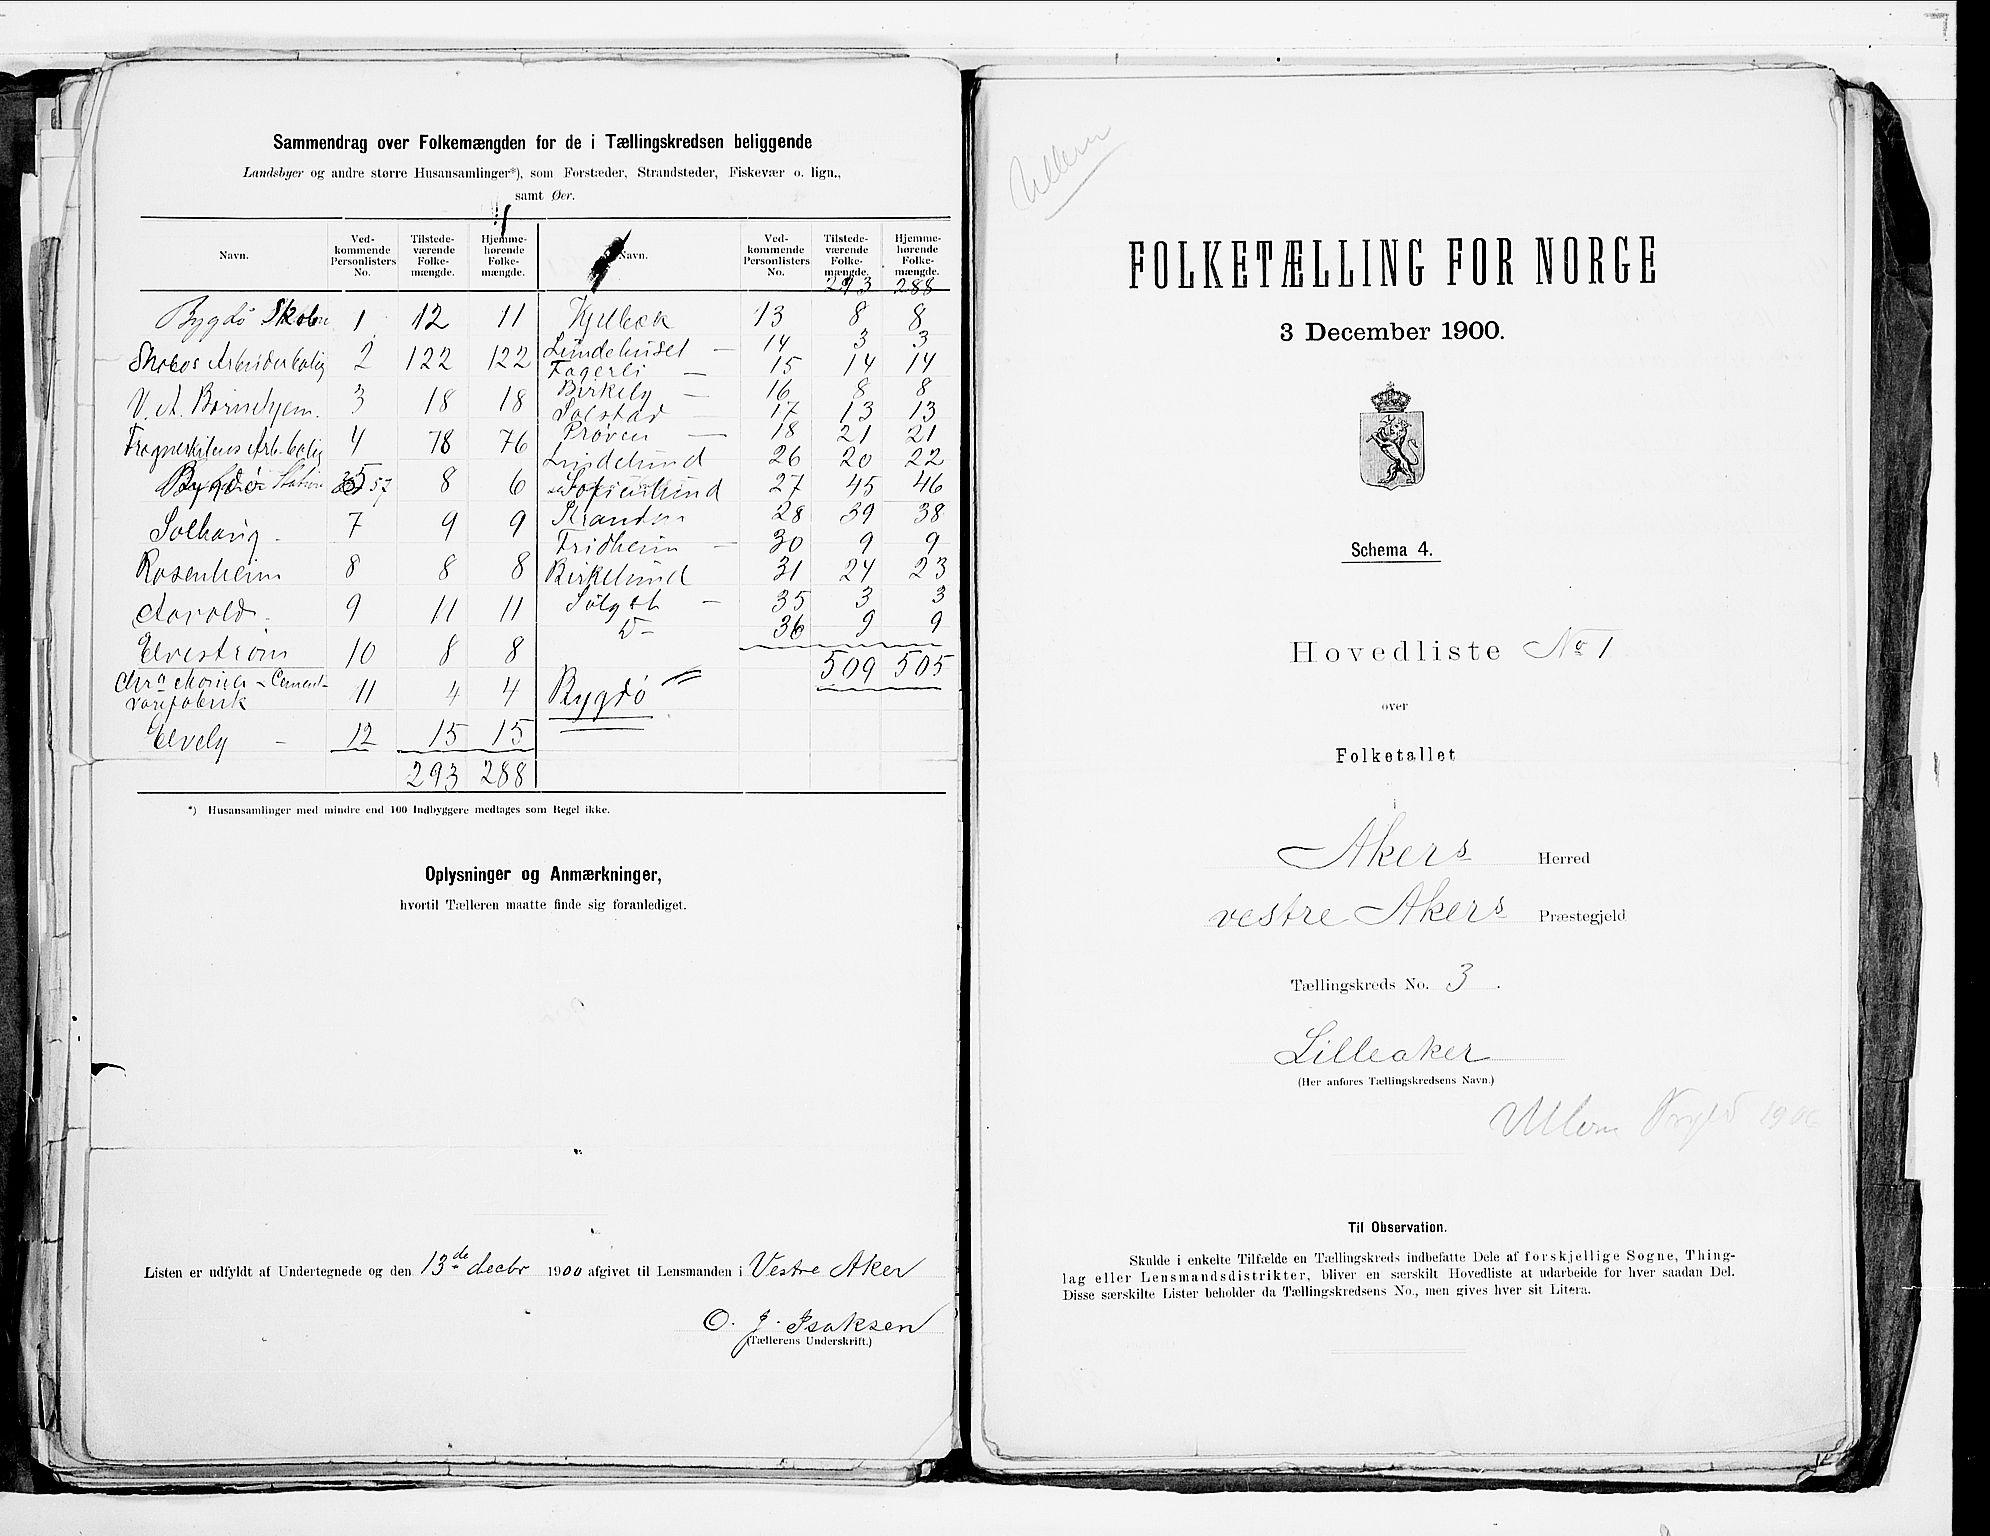 SAO, 1900 census for Aker, 1900, p. 44